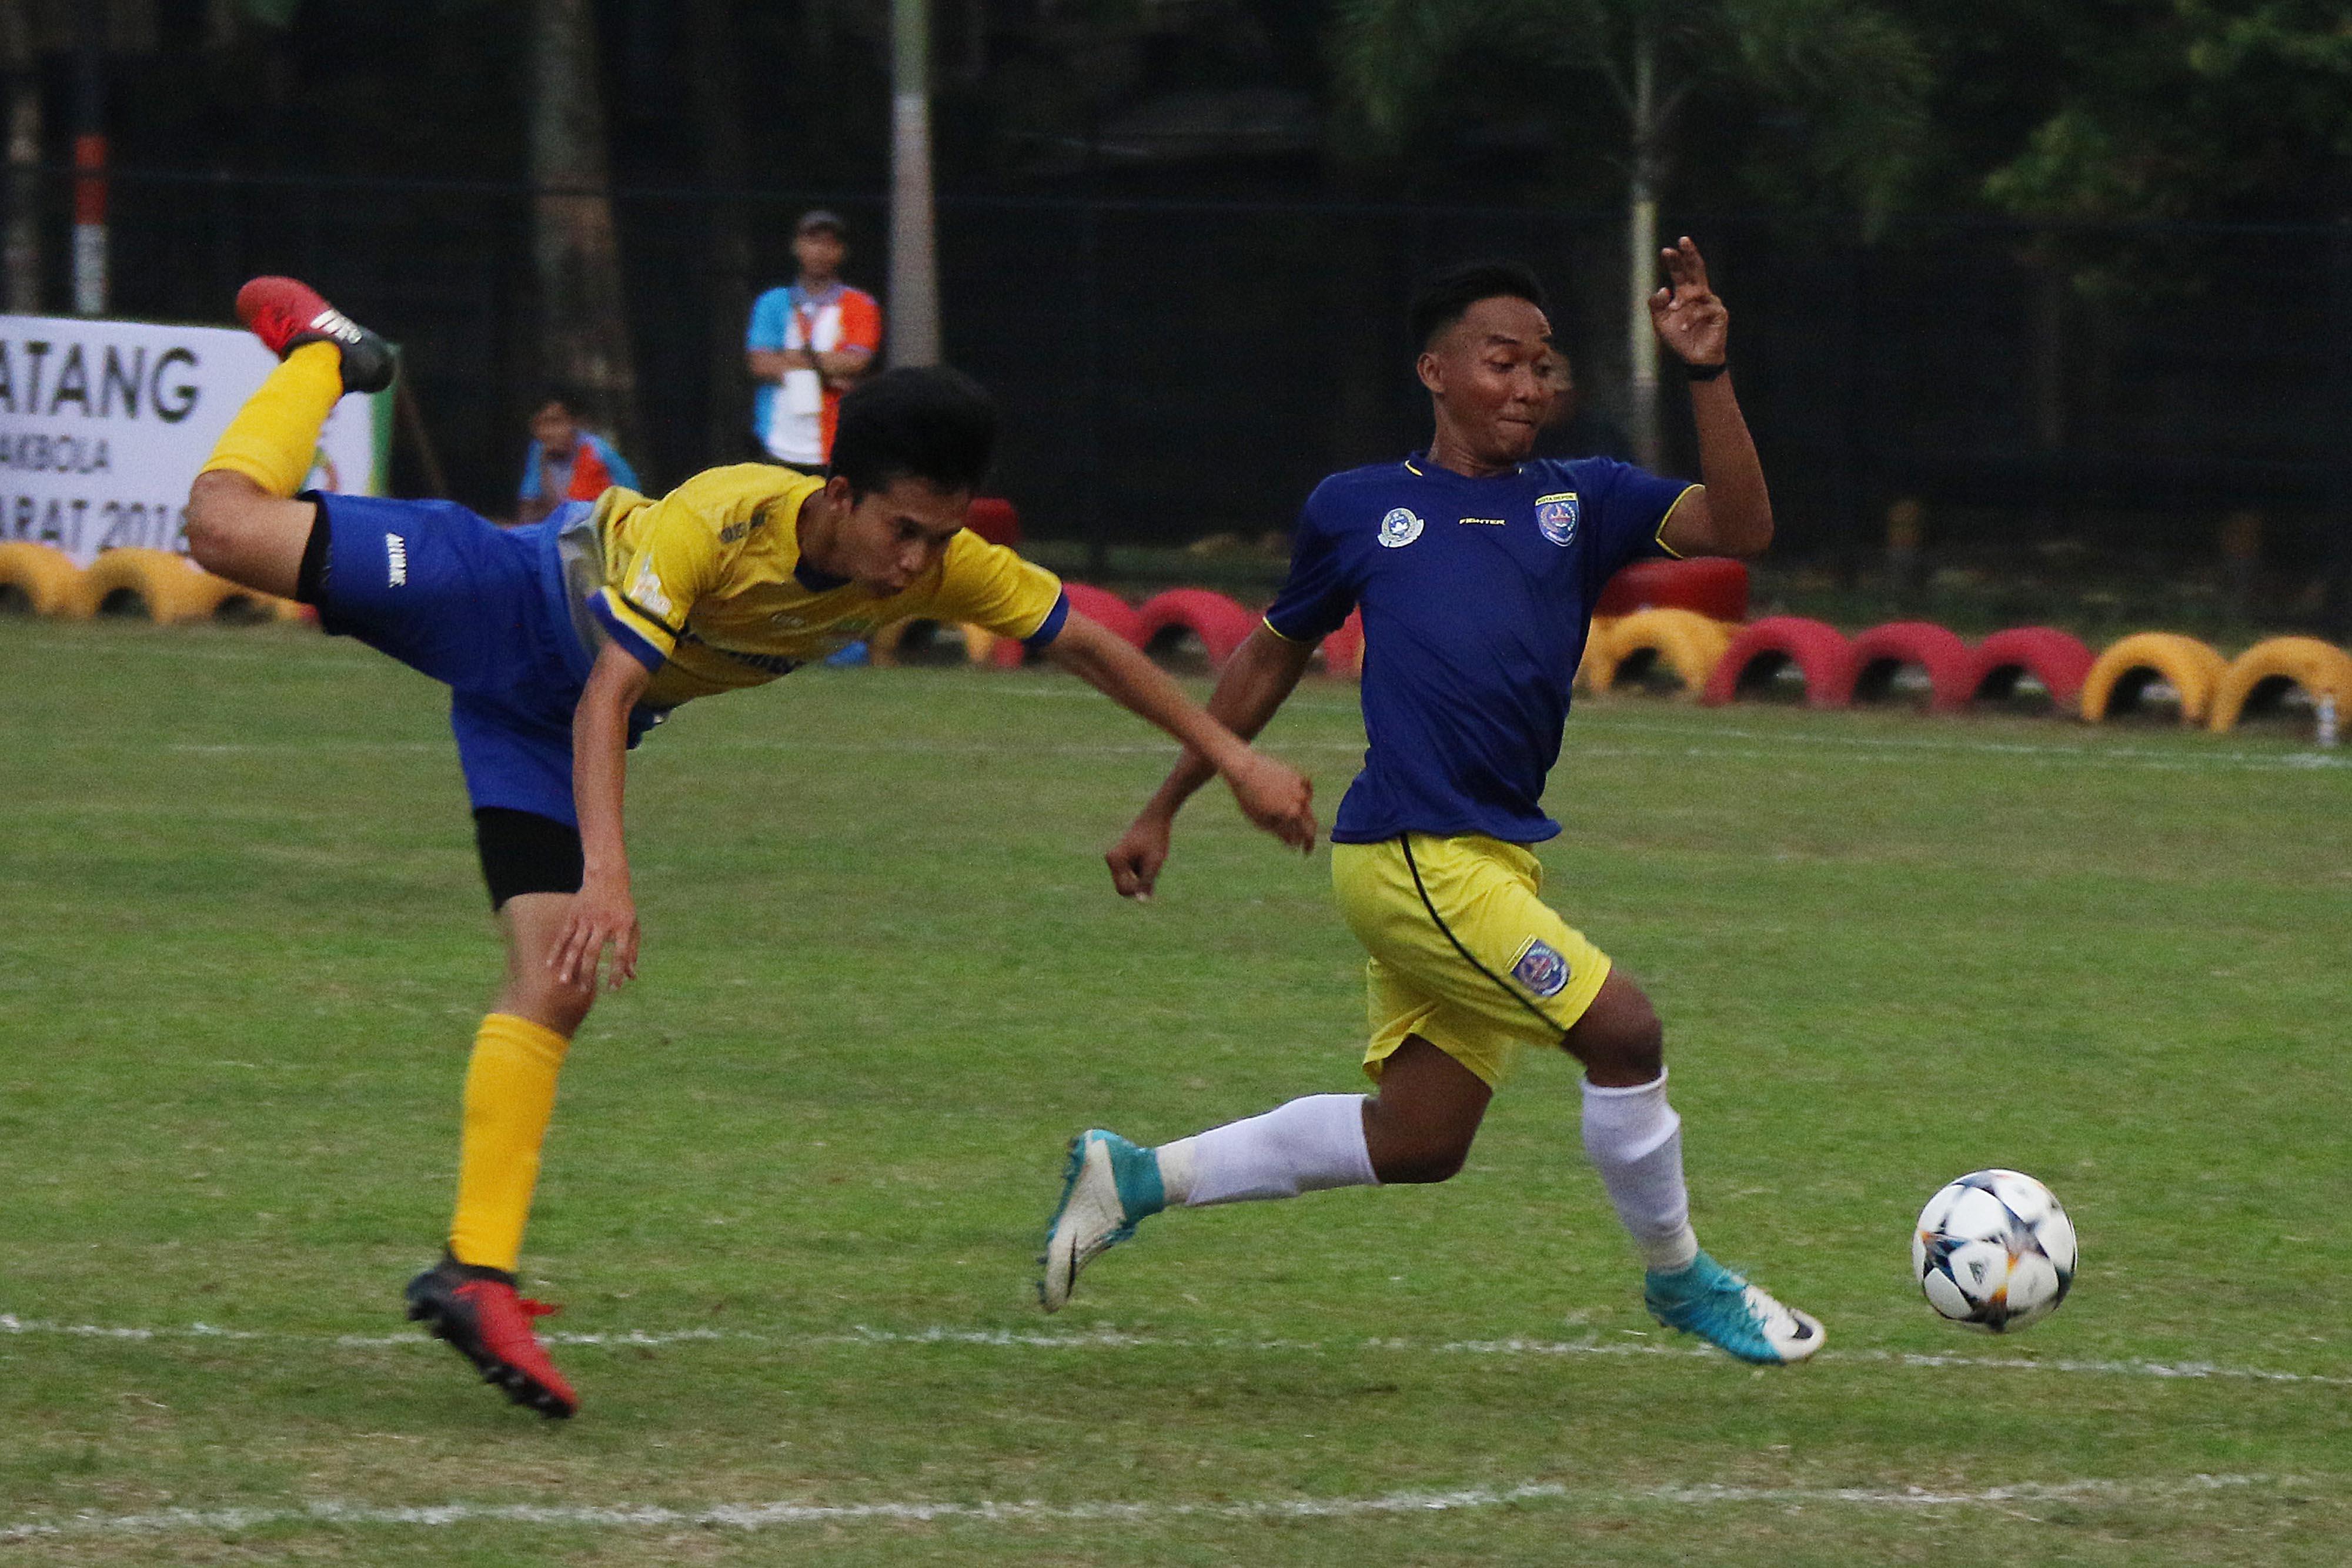 Pesepak bola Kota Depok, Haidar Fahmi Sadam (kanani) sedang beraksi dalam laga Kota Depok vs. Kab. Bekasi PORDA Jabar XIII-2018 di Lapangan Sepak Bola Brimob Kedung Halang, Bogor, Senin (1/10) sore. Kota Depok berhasil menang 3-2 melawan Kab. Bekasi. KONI KOTA DEPOK/Faruqi/2018